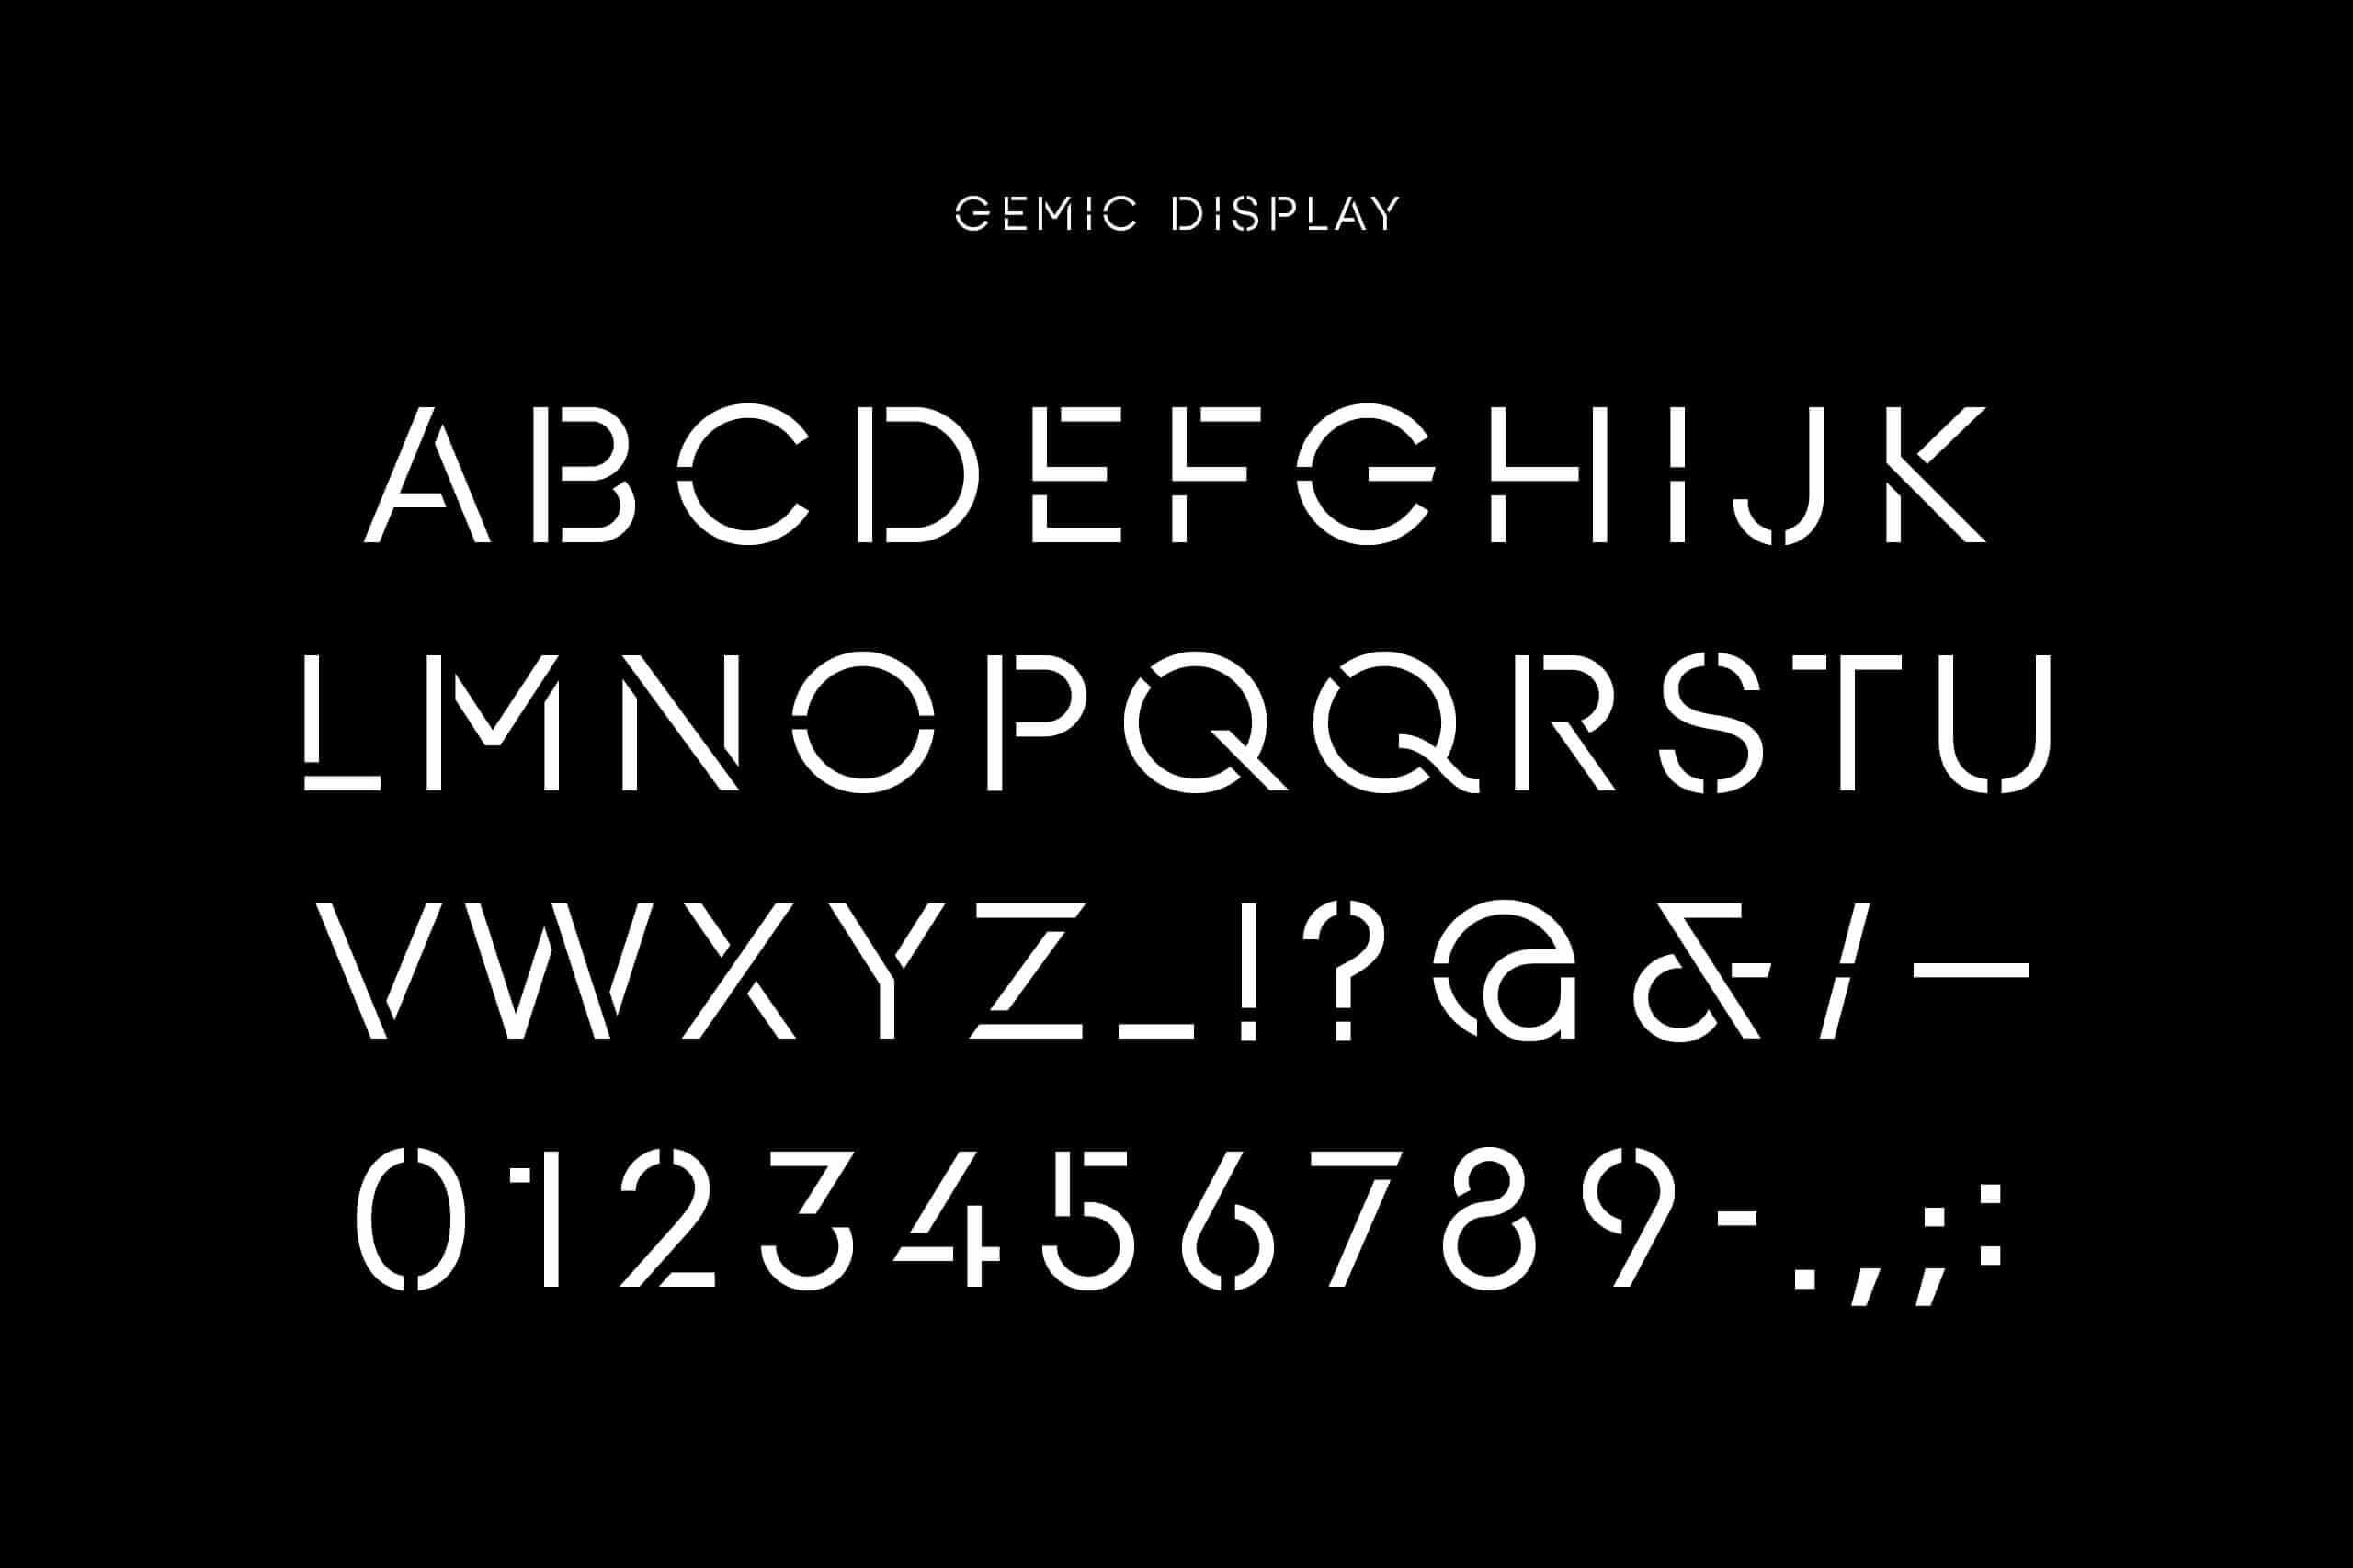 GEMIC_10_Compressed